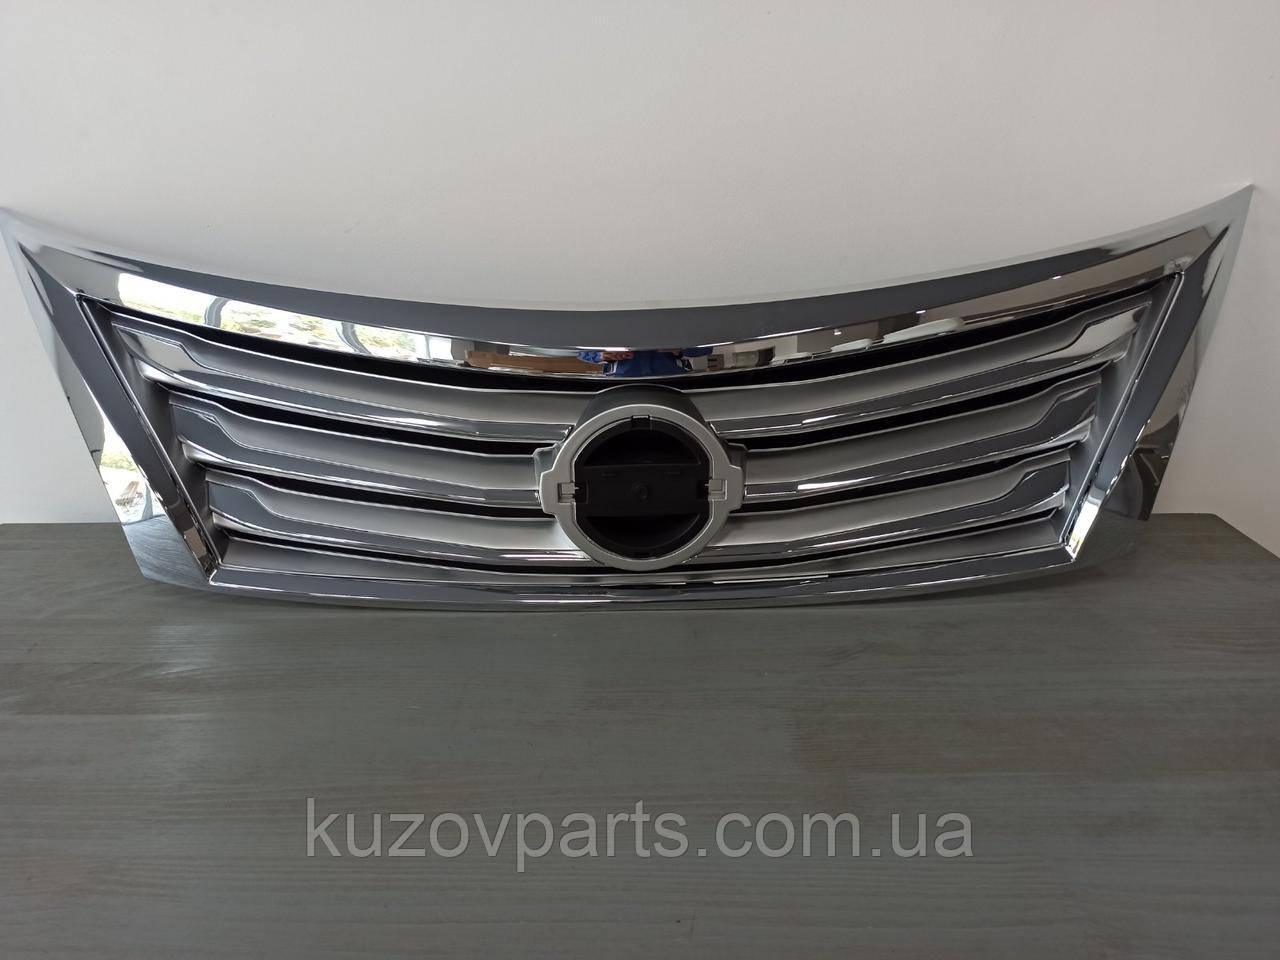 Решетка радиатора Nissan Altima 2013 2014 2015 62310-3TA0A